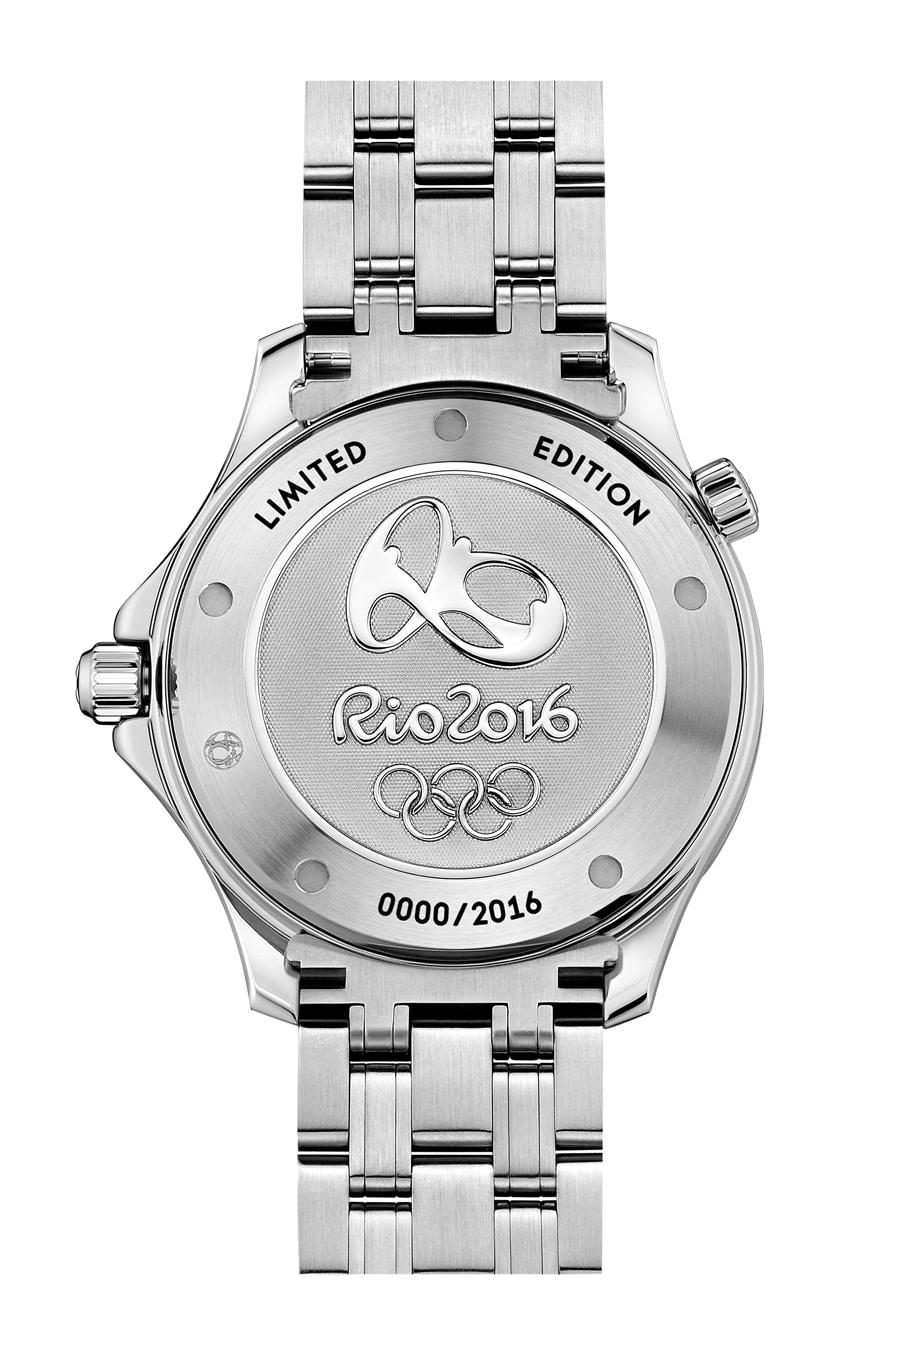 Gehäuseboden der Omega Seamster 300M Rio 2016